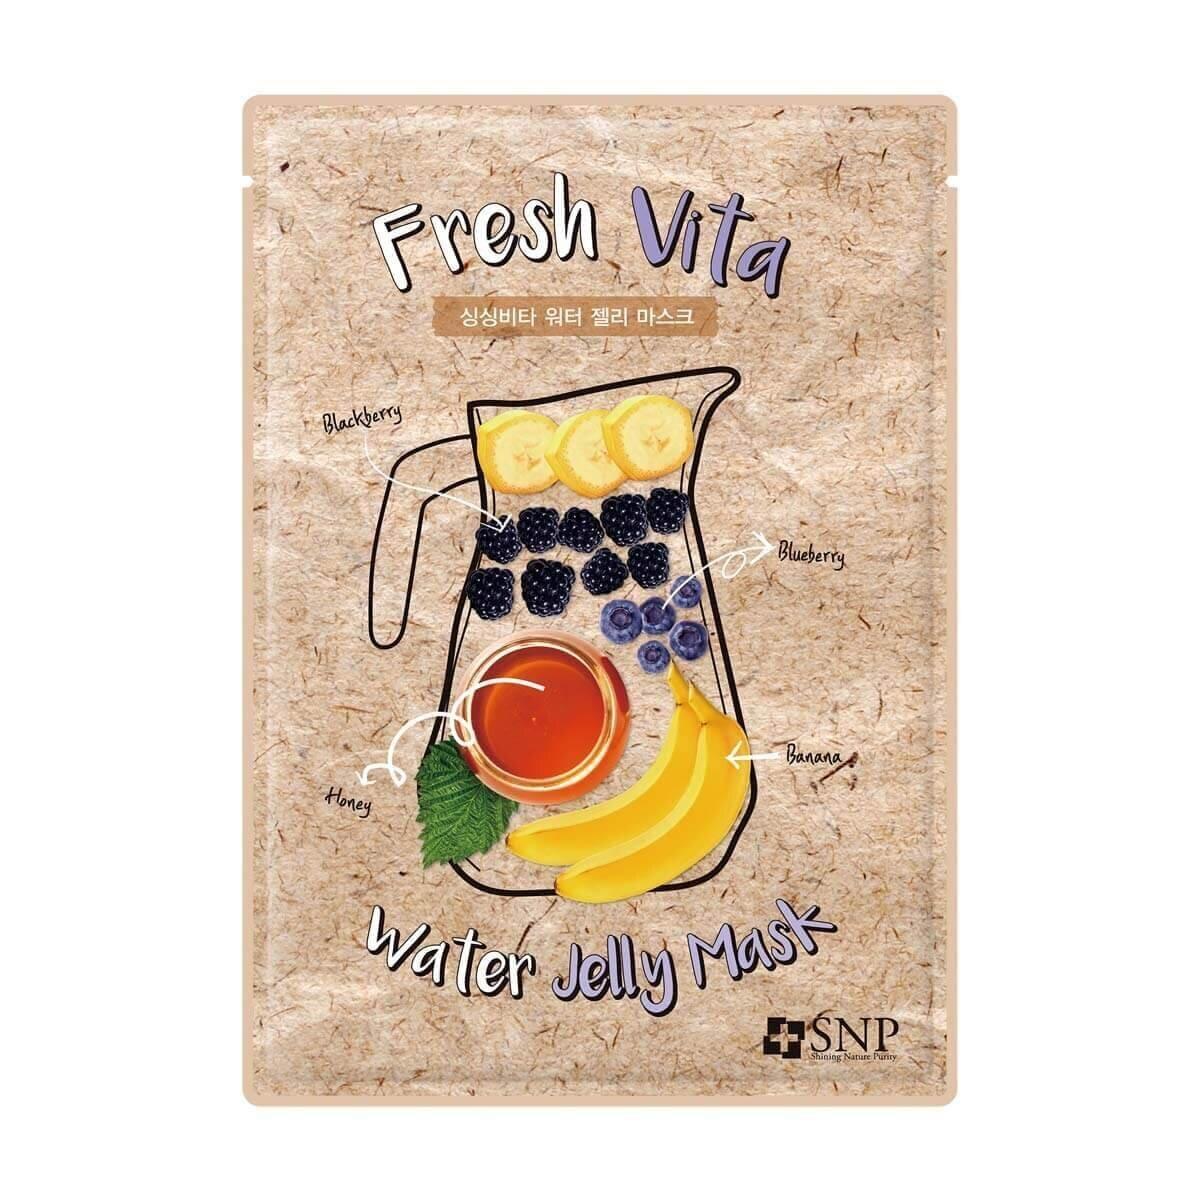 Fresh Vita Water Jelly Maske 33ml